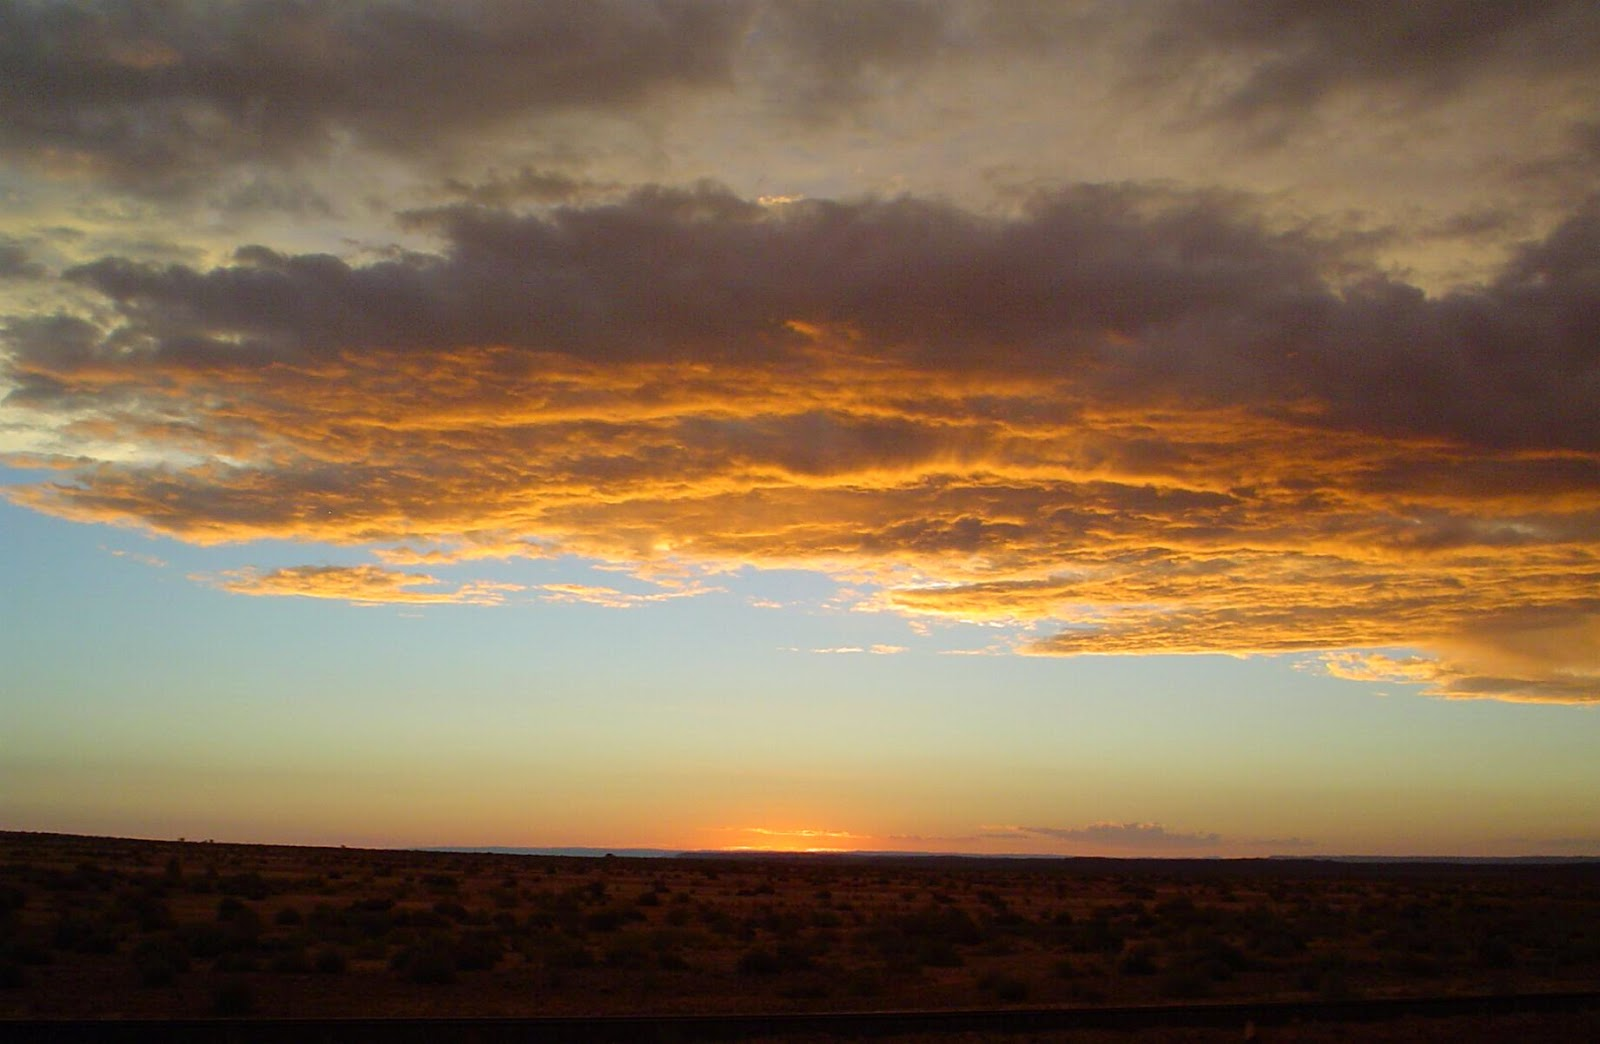 Sunsets in Namibia - www.namibweb.com